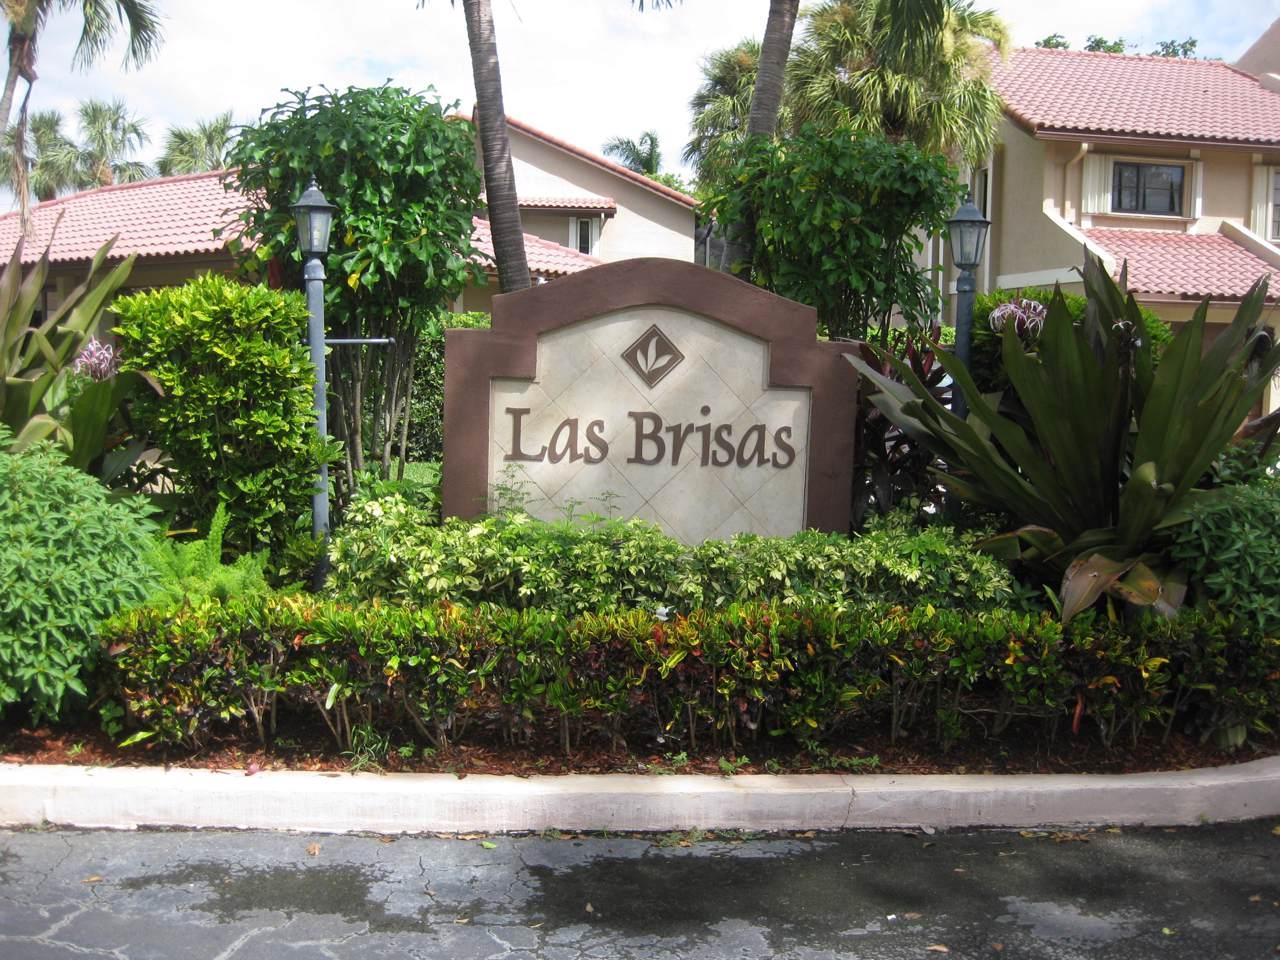 22075 Las Brisas Circle - Photo 1